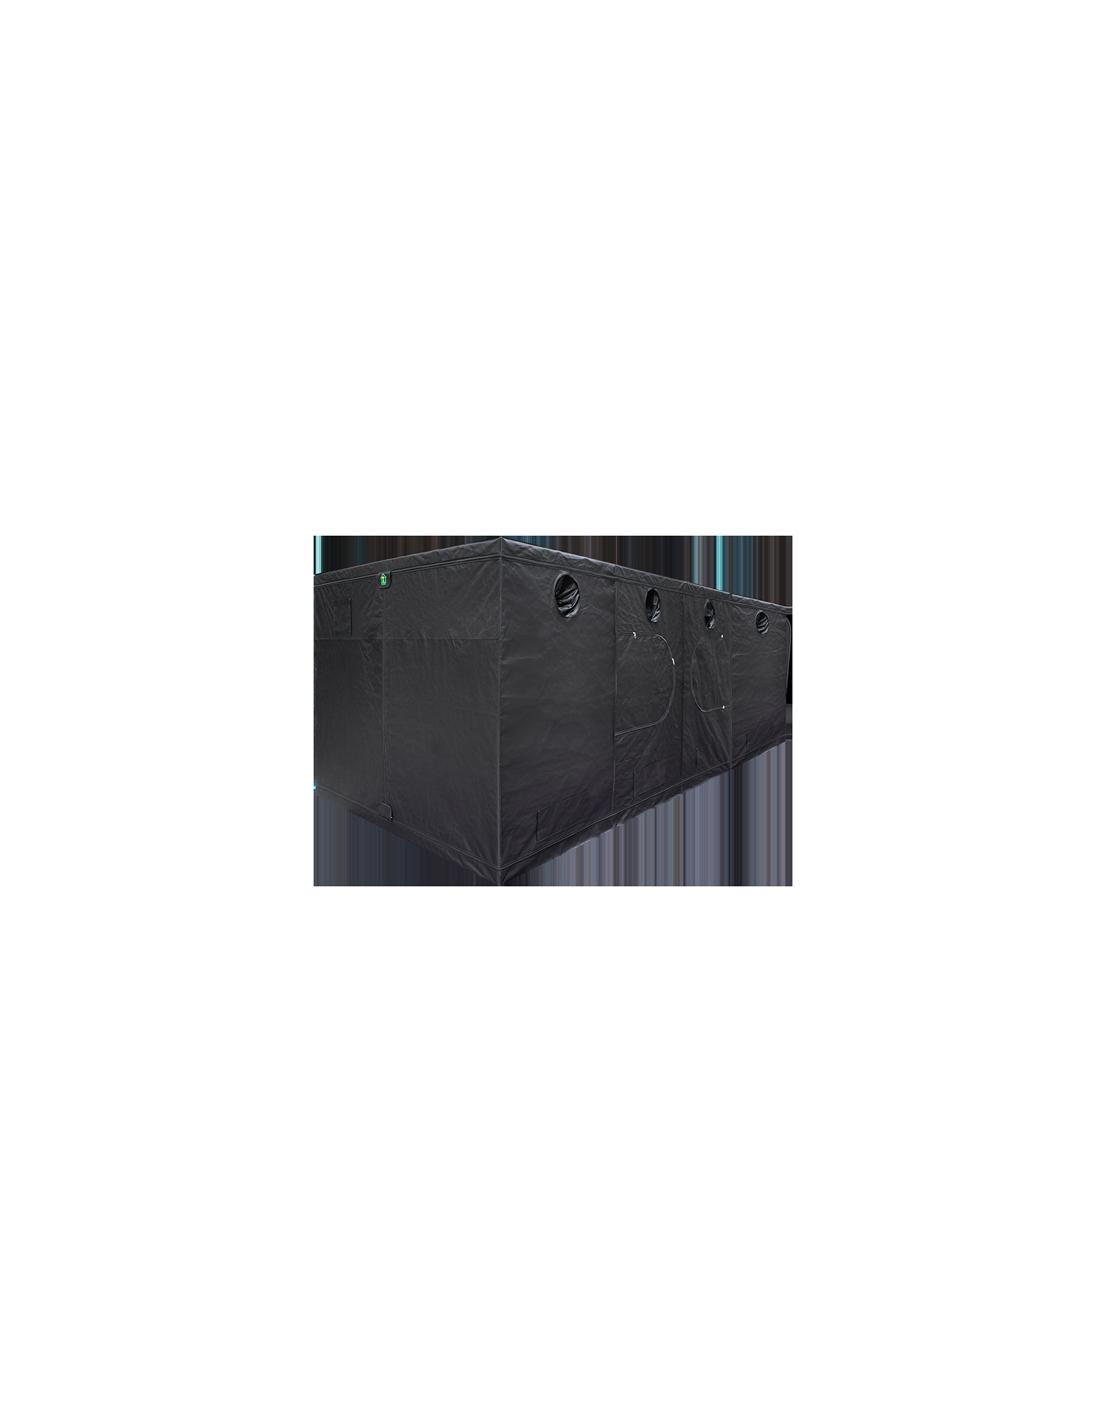 Dr. Green GR480 480x240x215cm